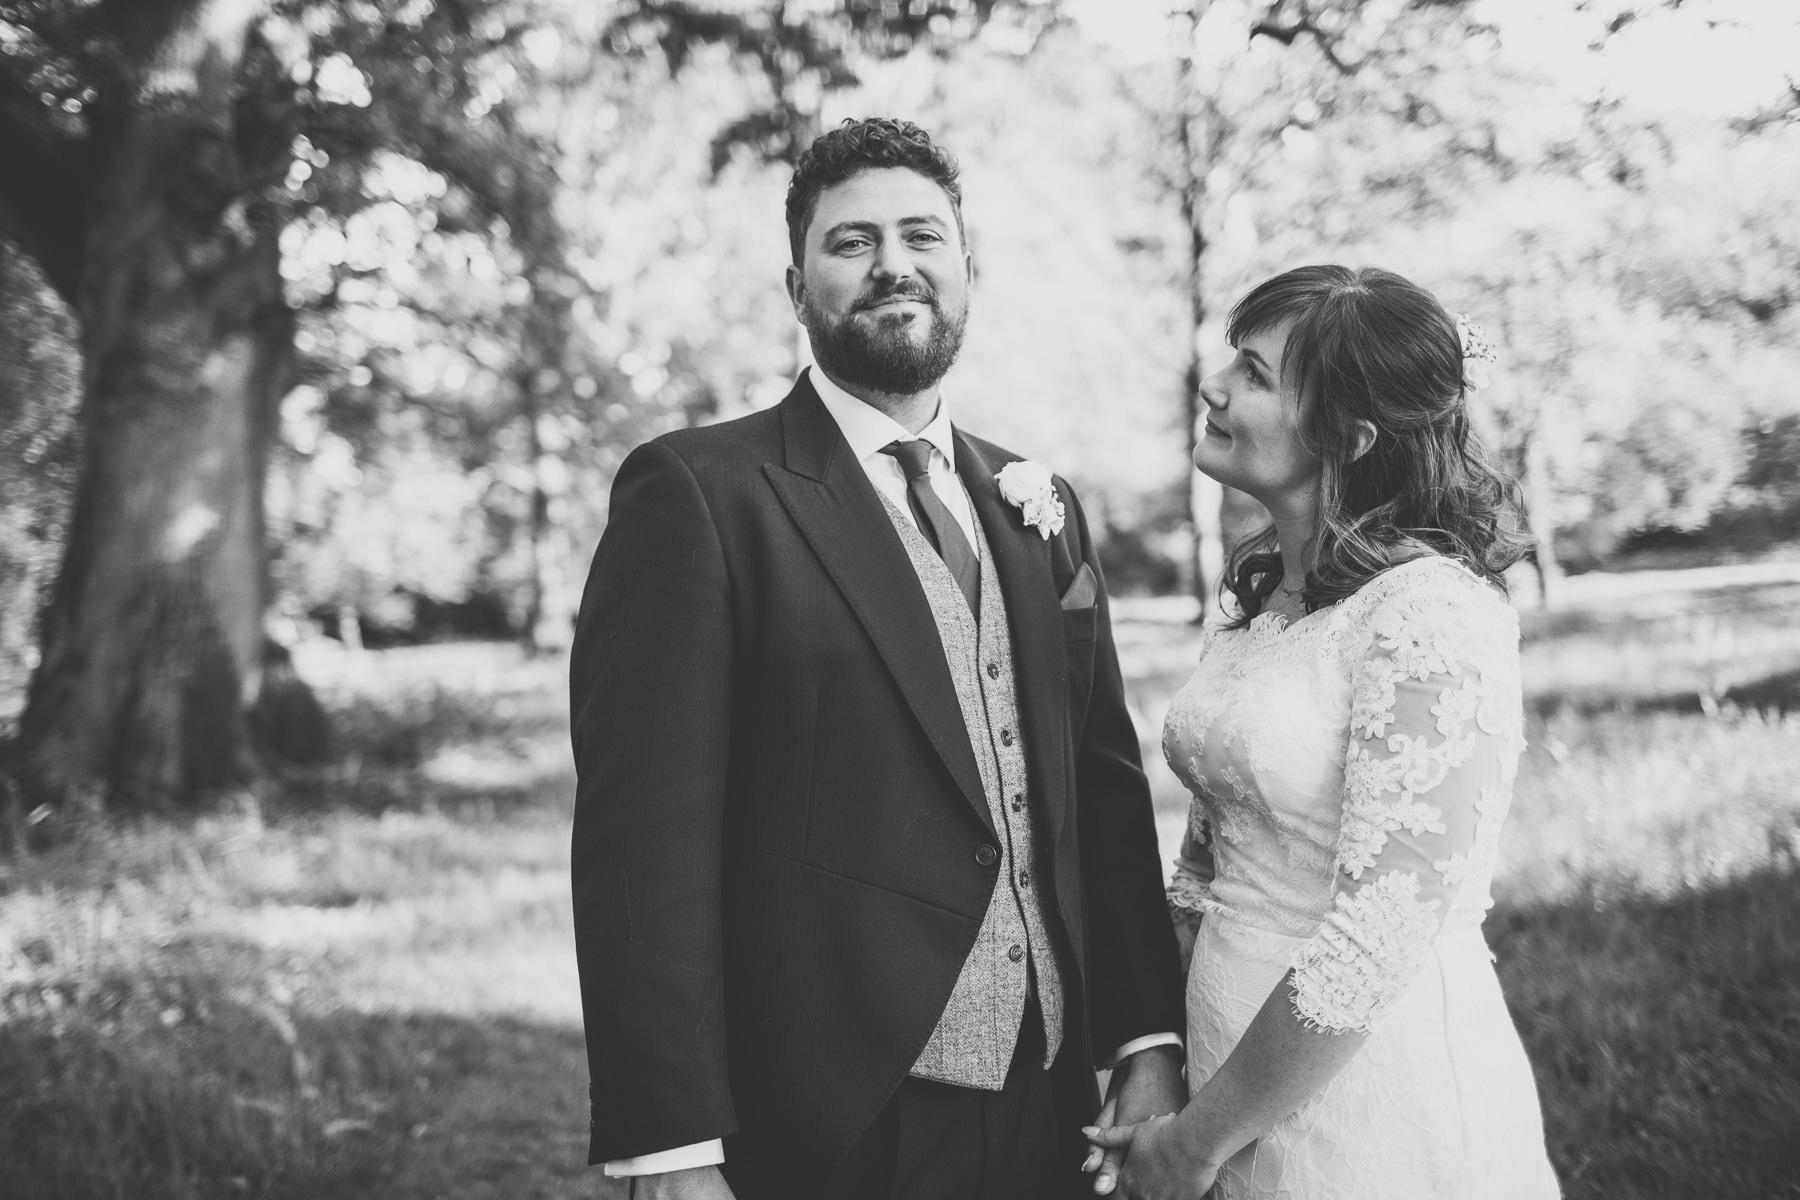 Pamber-Place-wedding-photography-basingstoke-hampshire-185